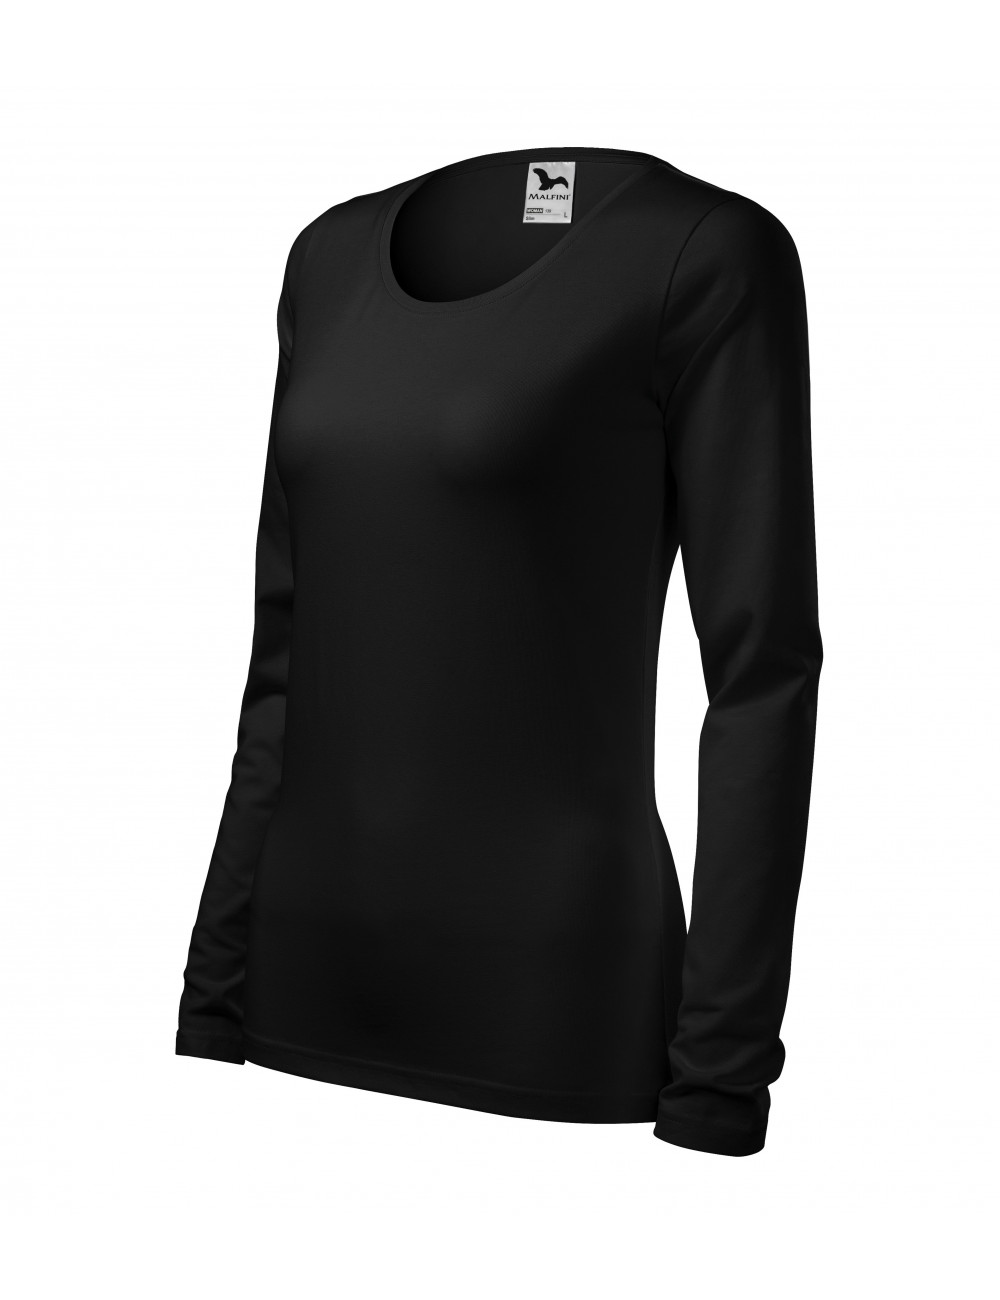 Adler MALFINI Koszulka damska Slim 139 czarny